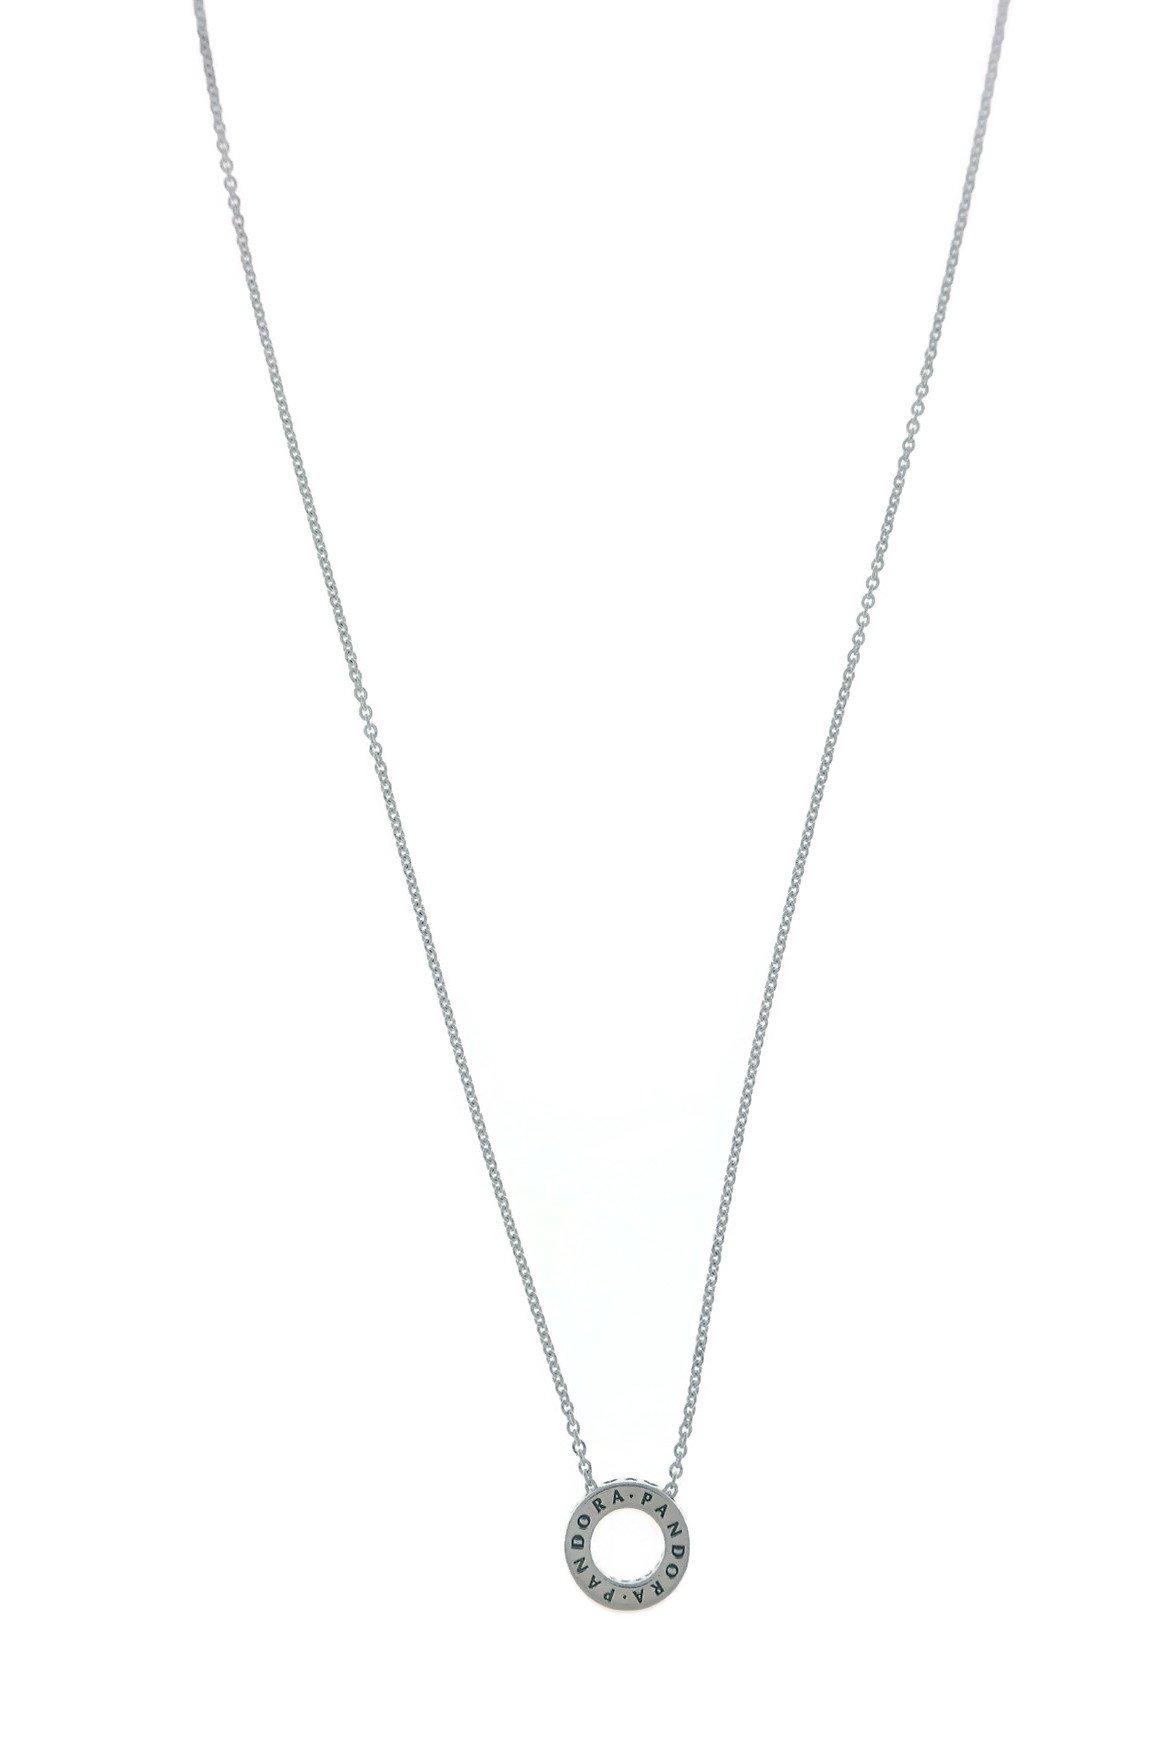 PANDORA-Hearts-of-PANDORA-Necklace-397436CZ-45